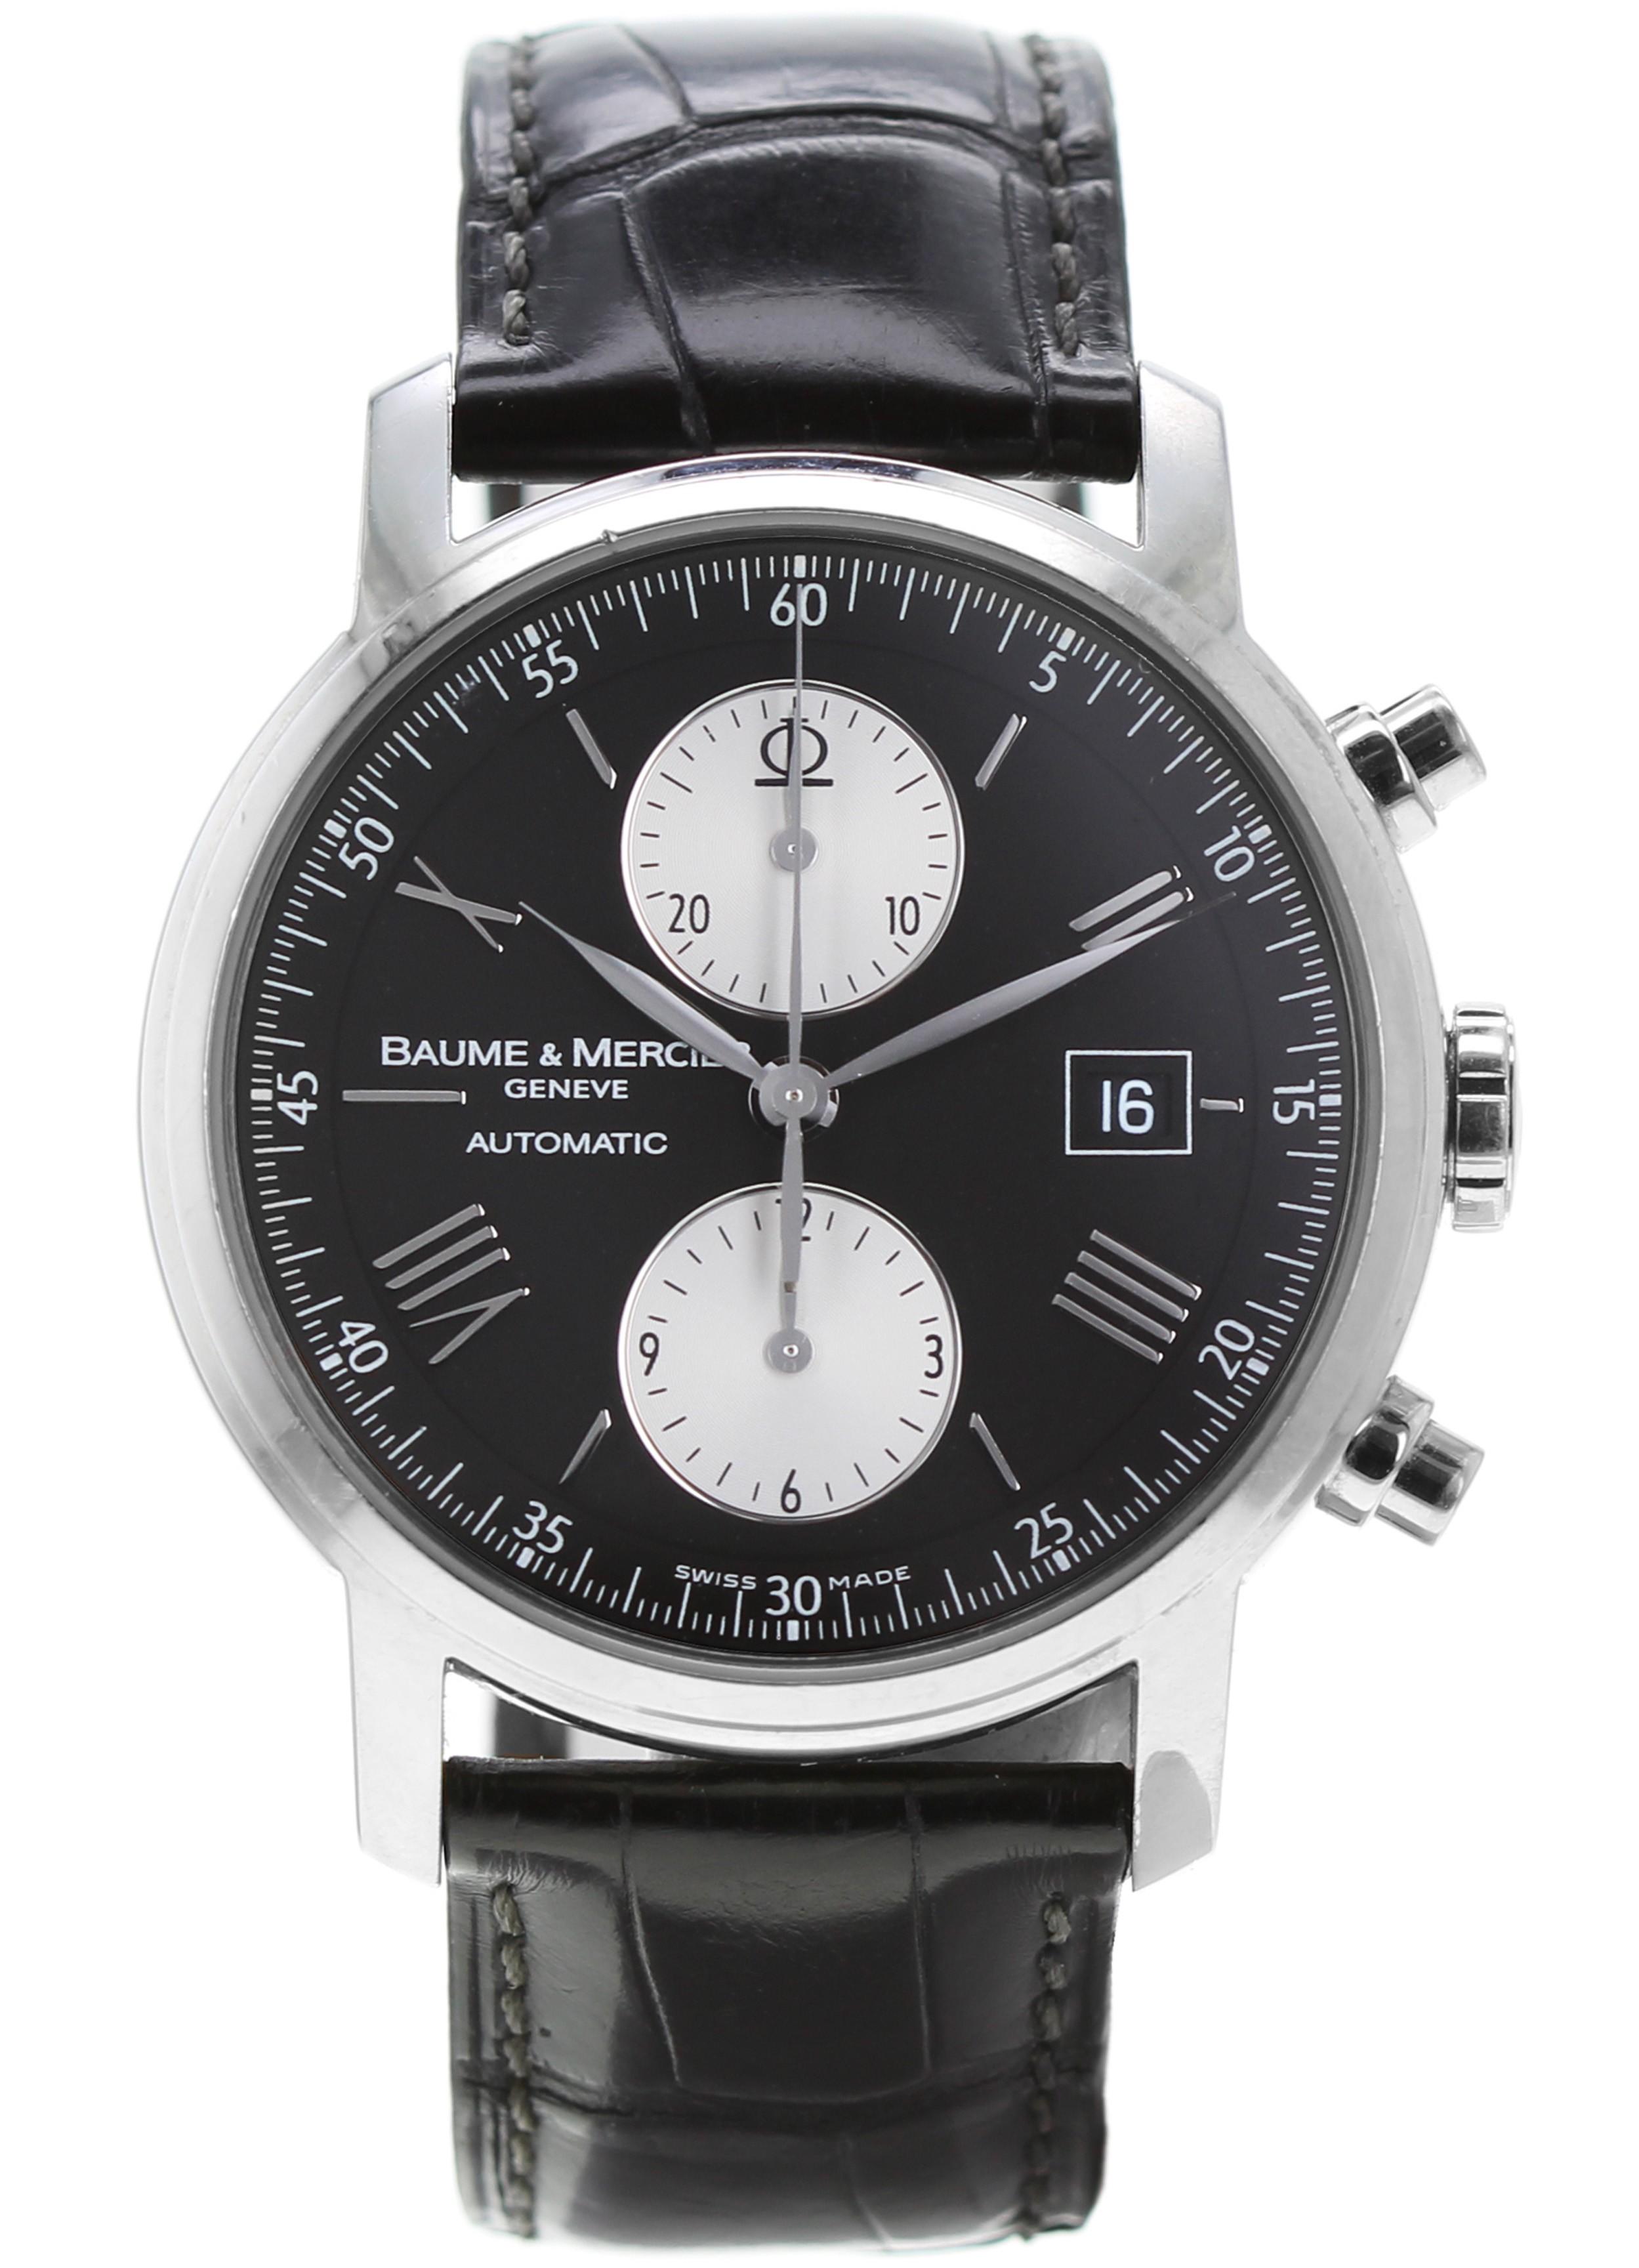 ddccb80d04dba1 BAUME & MERCIER Classima Executives XL Automatic - Leather Bracelet - Steel  case